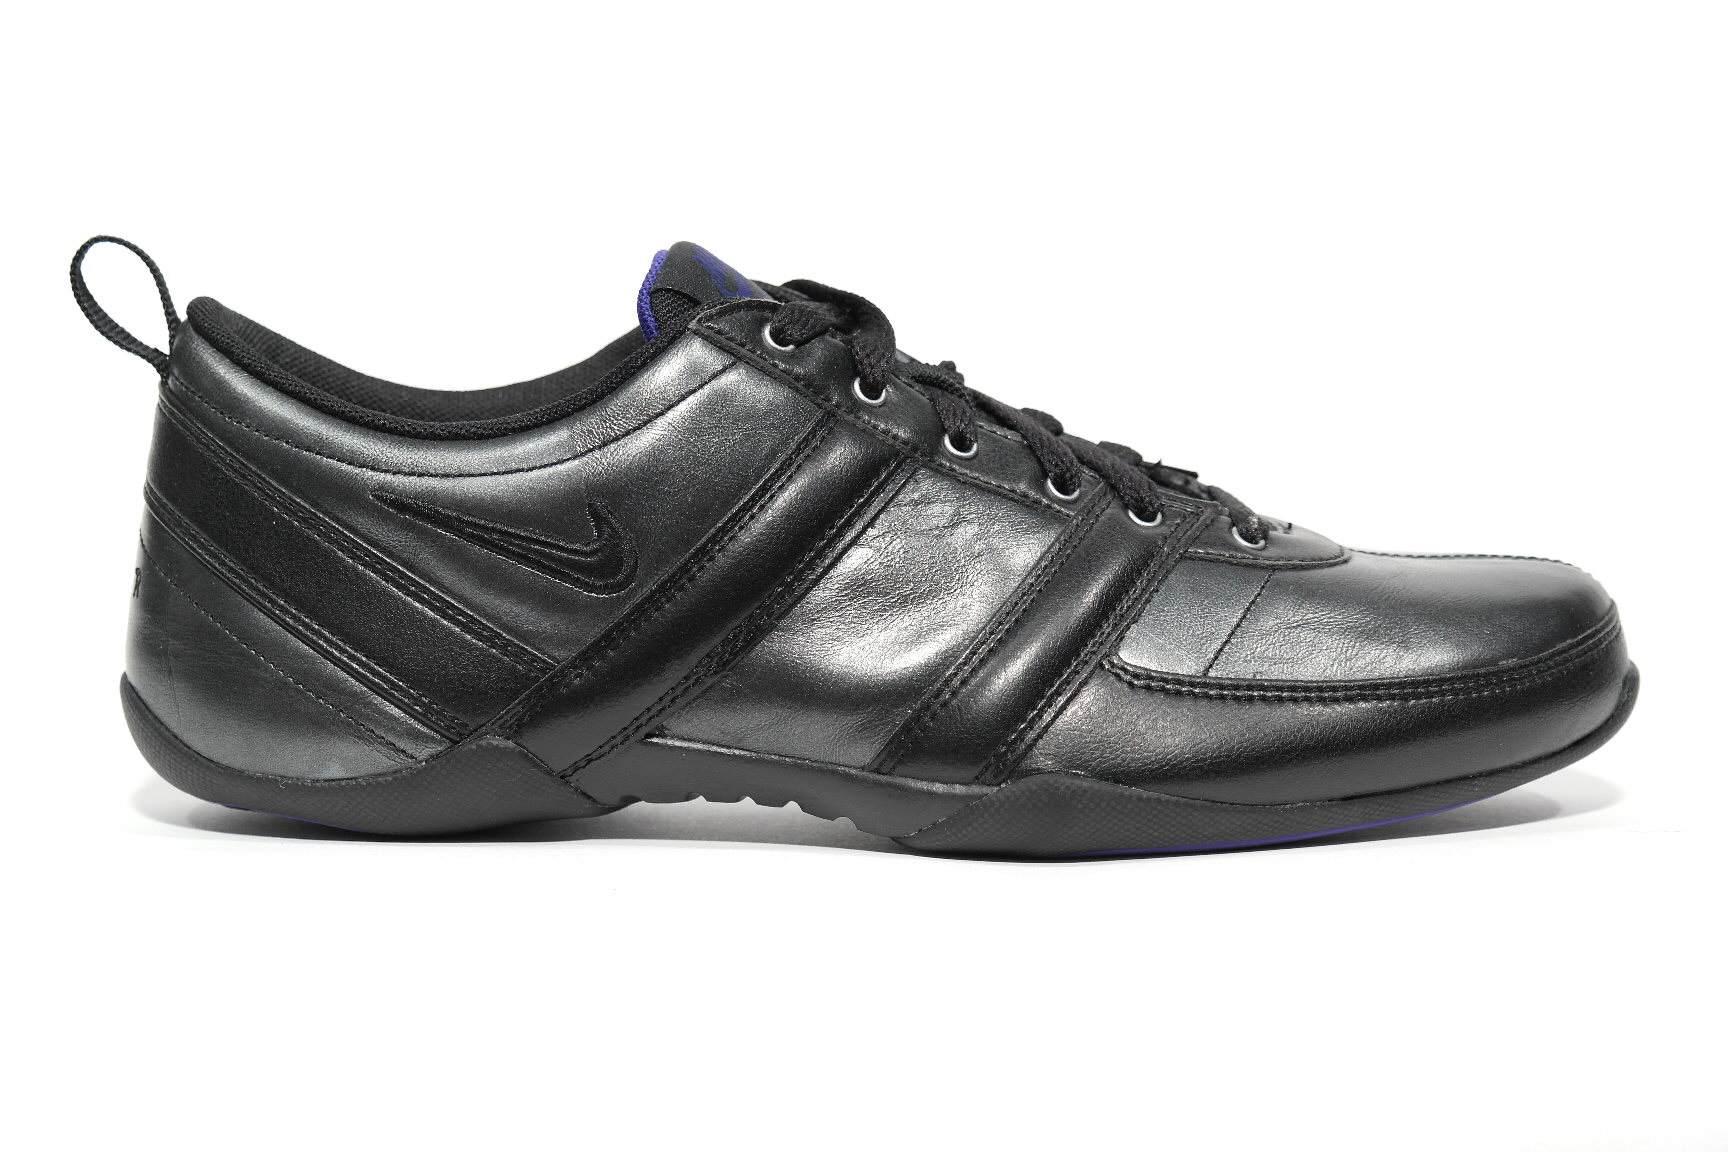 Nike Kinderschoenen Zwart